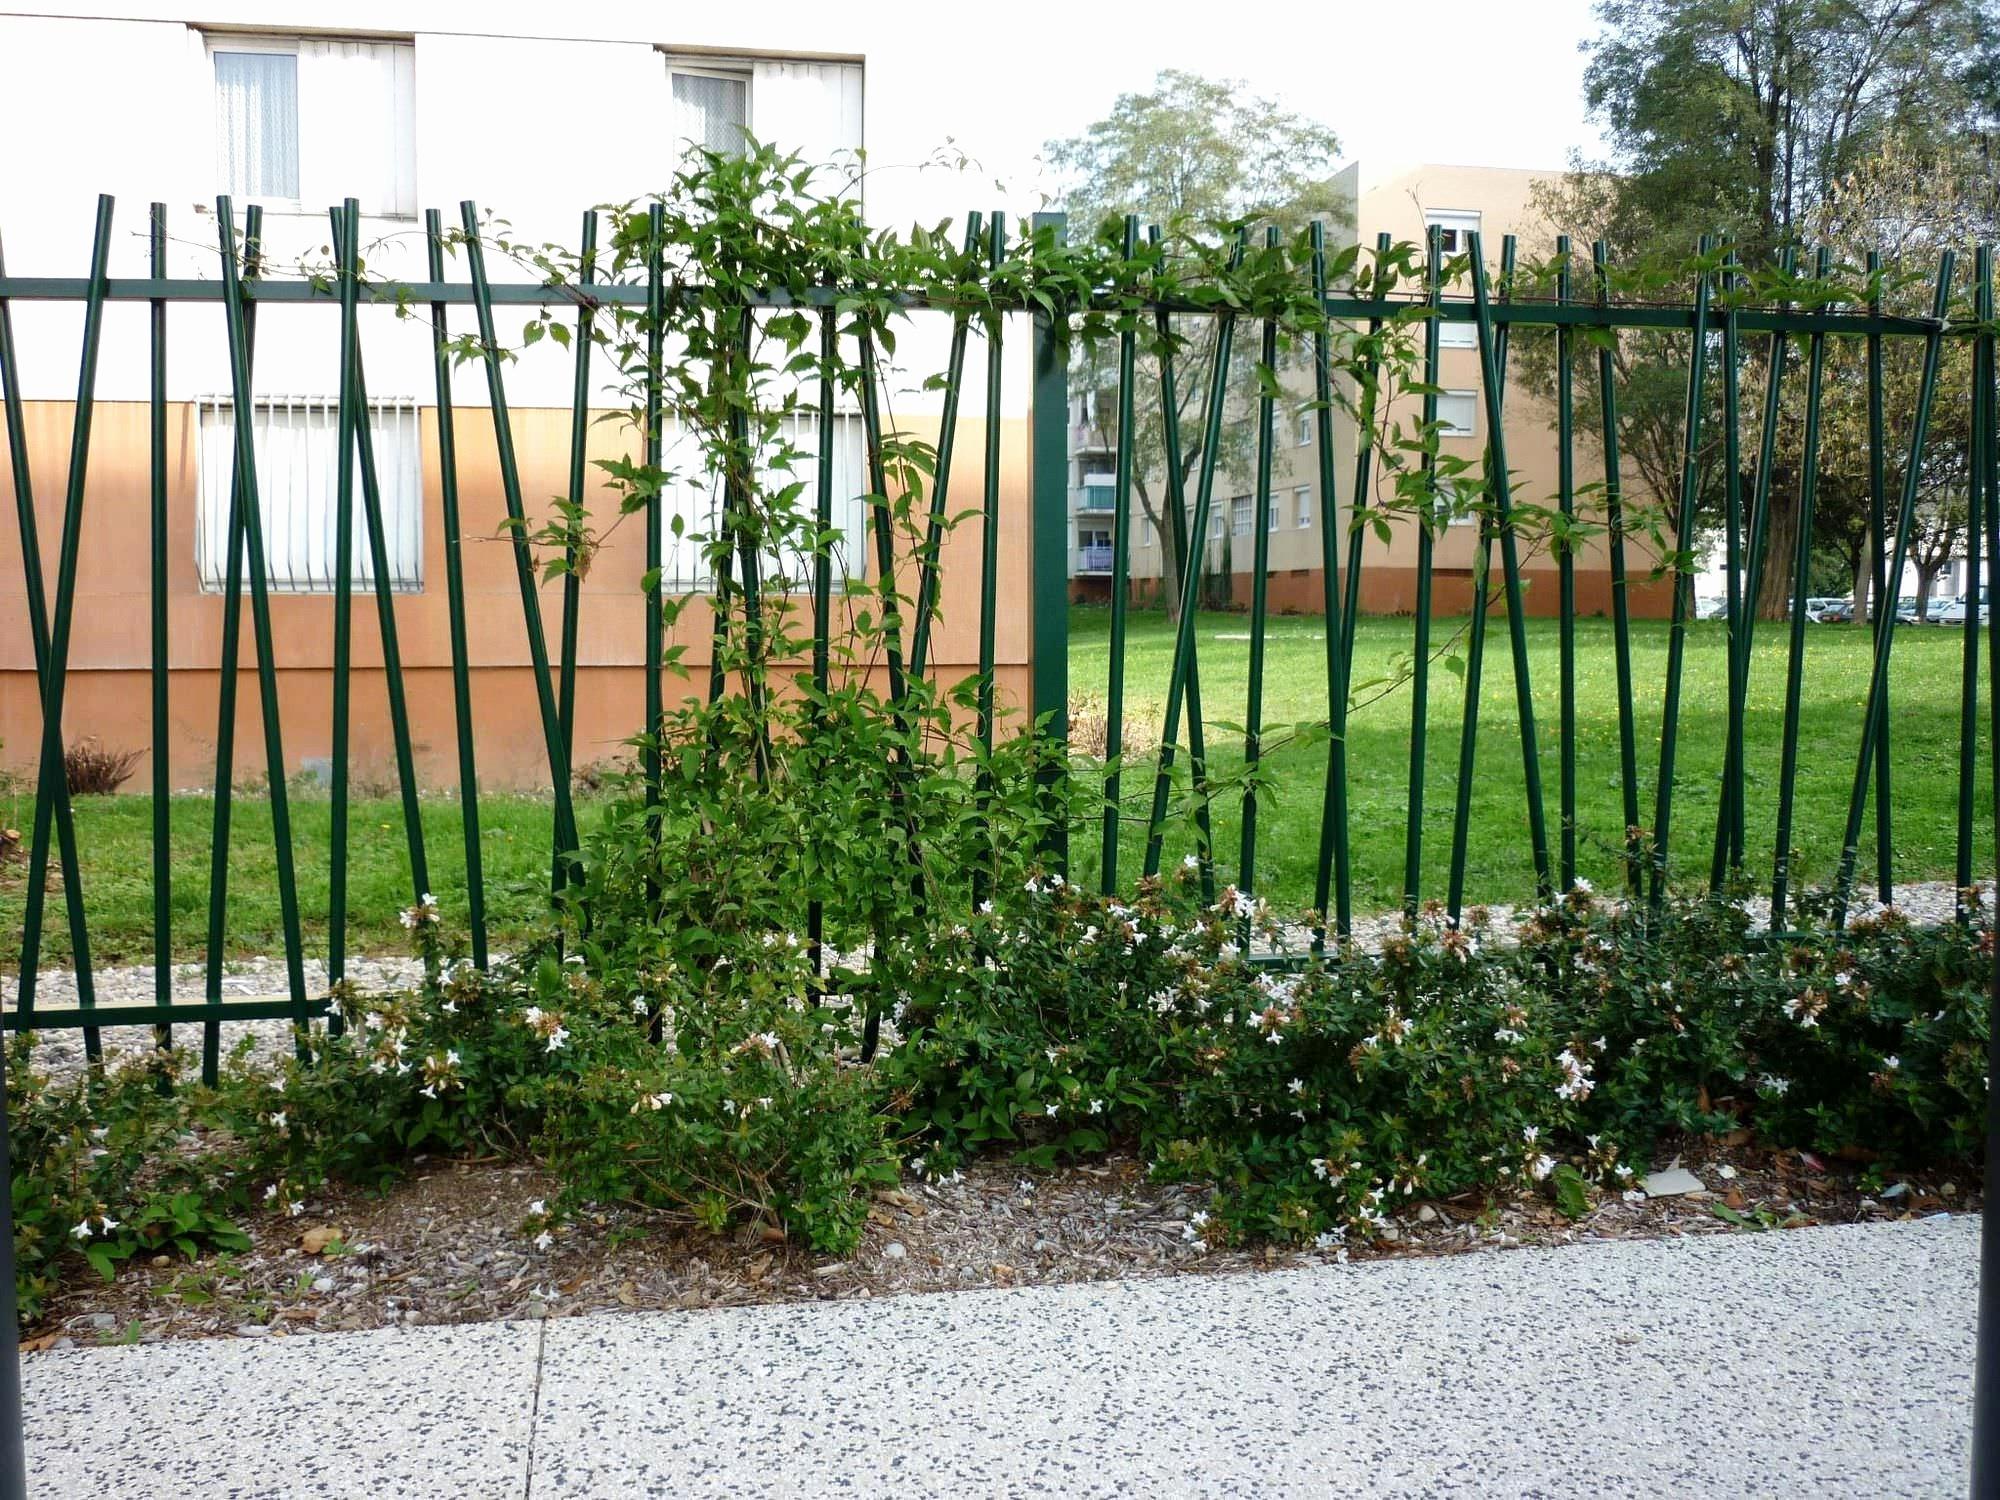 Abri Jardin Pas Cher Occasion Beau Collection Abri De Jardin Bois Occasion De Traditionnel Cabane De Jardin